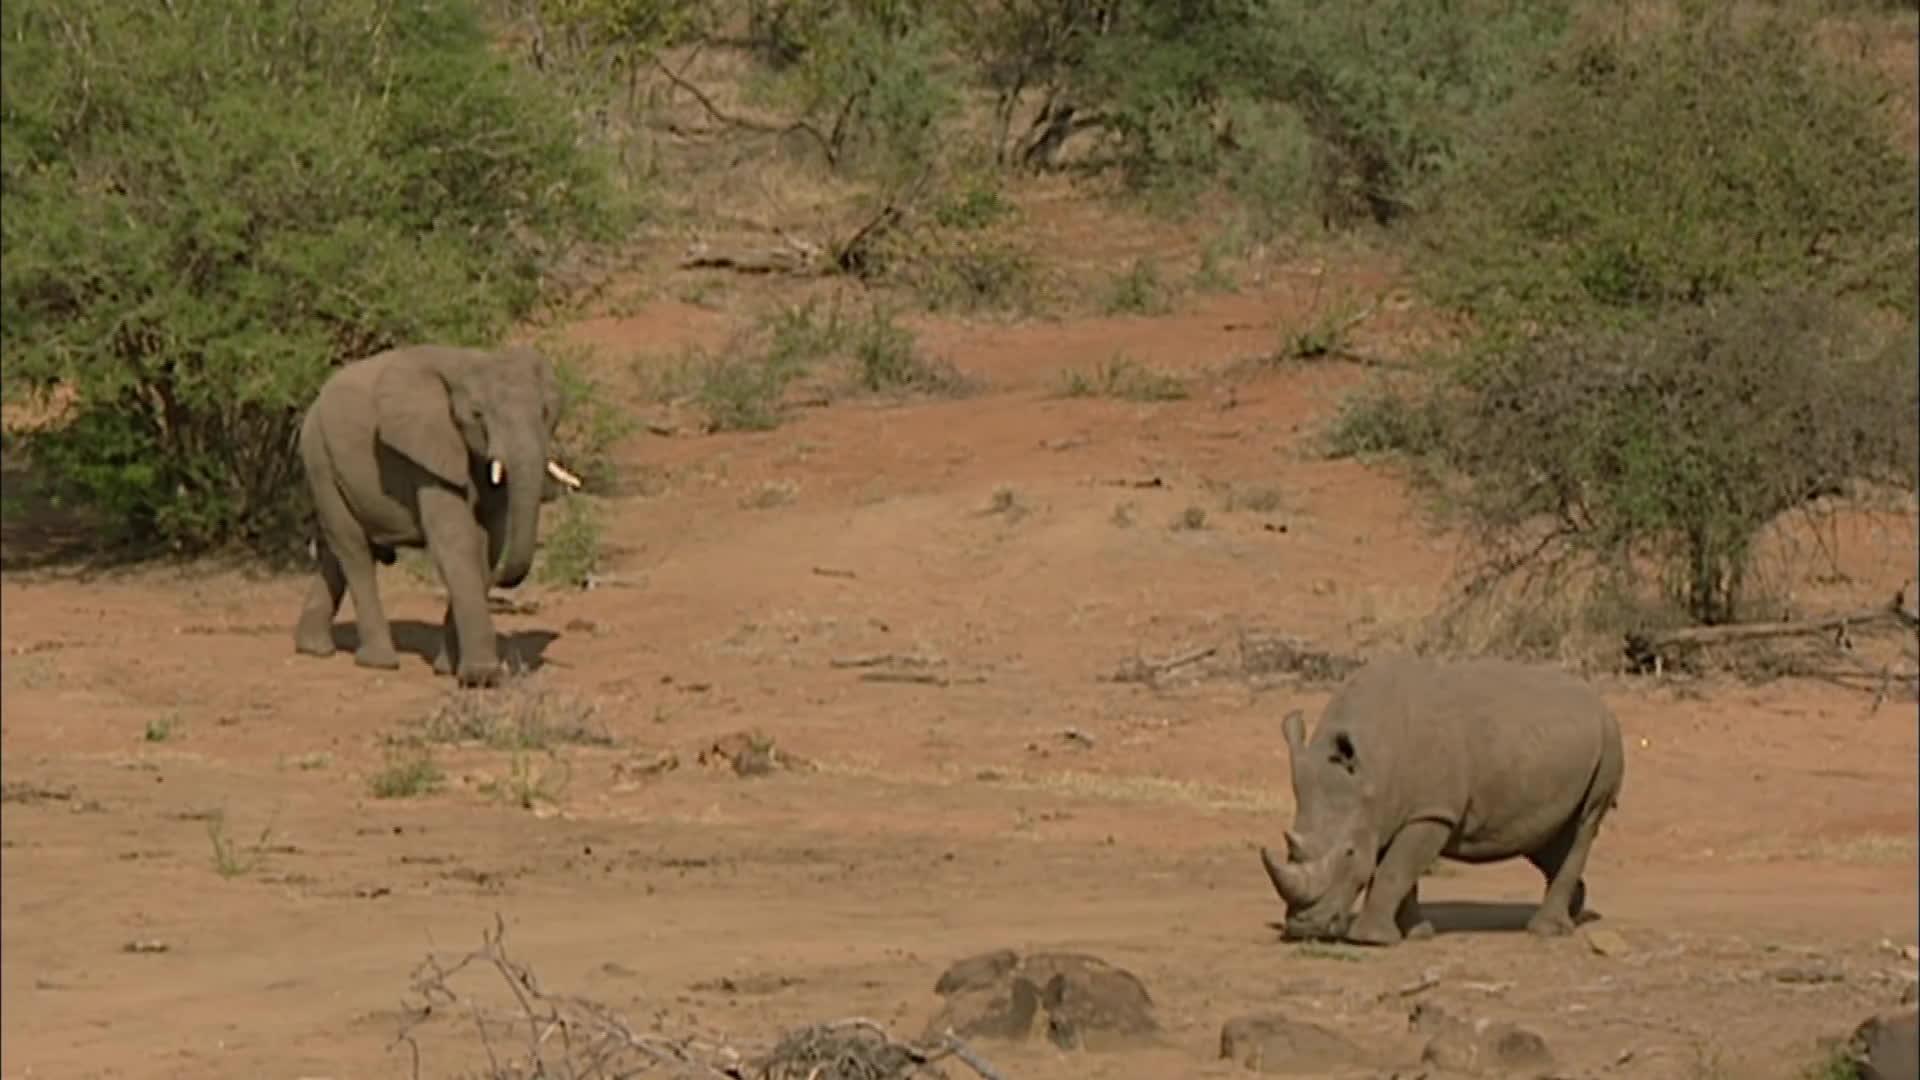 elephant, elephants, gifs, rhino, rhinoceros, Elephant vs Rhino: The Delinquents of Pilanesberg GIFs